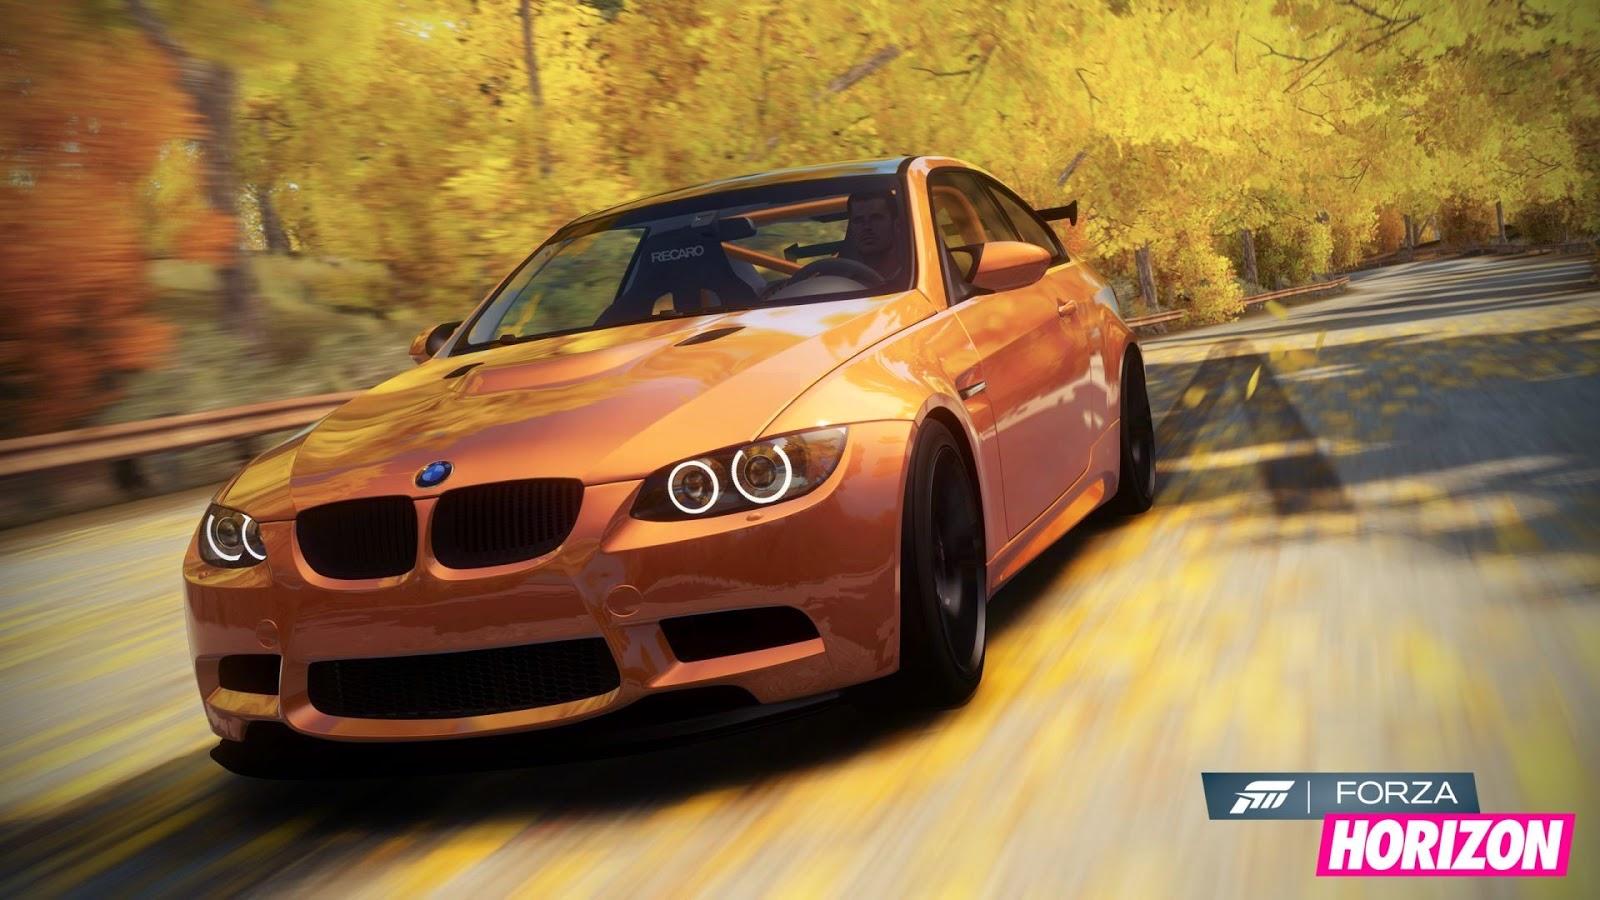 WallpapersKu Forza Horizon Game Wallpapers 1600x900